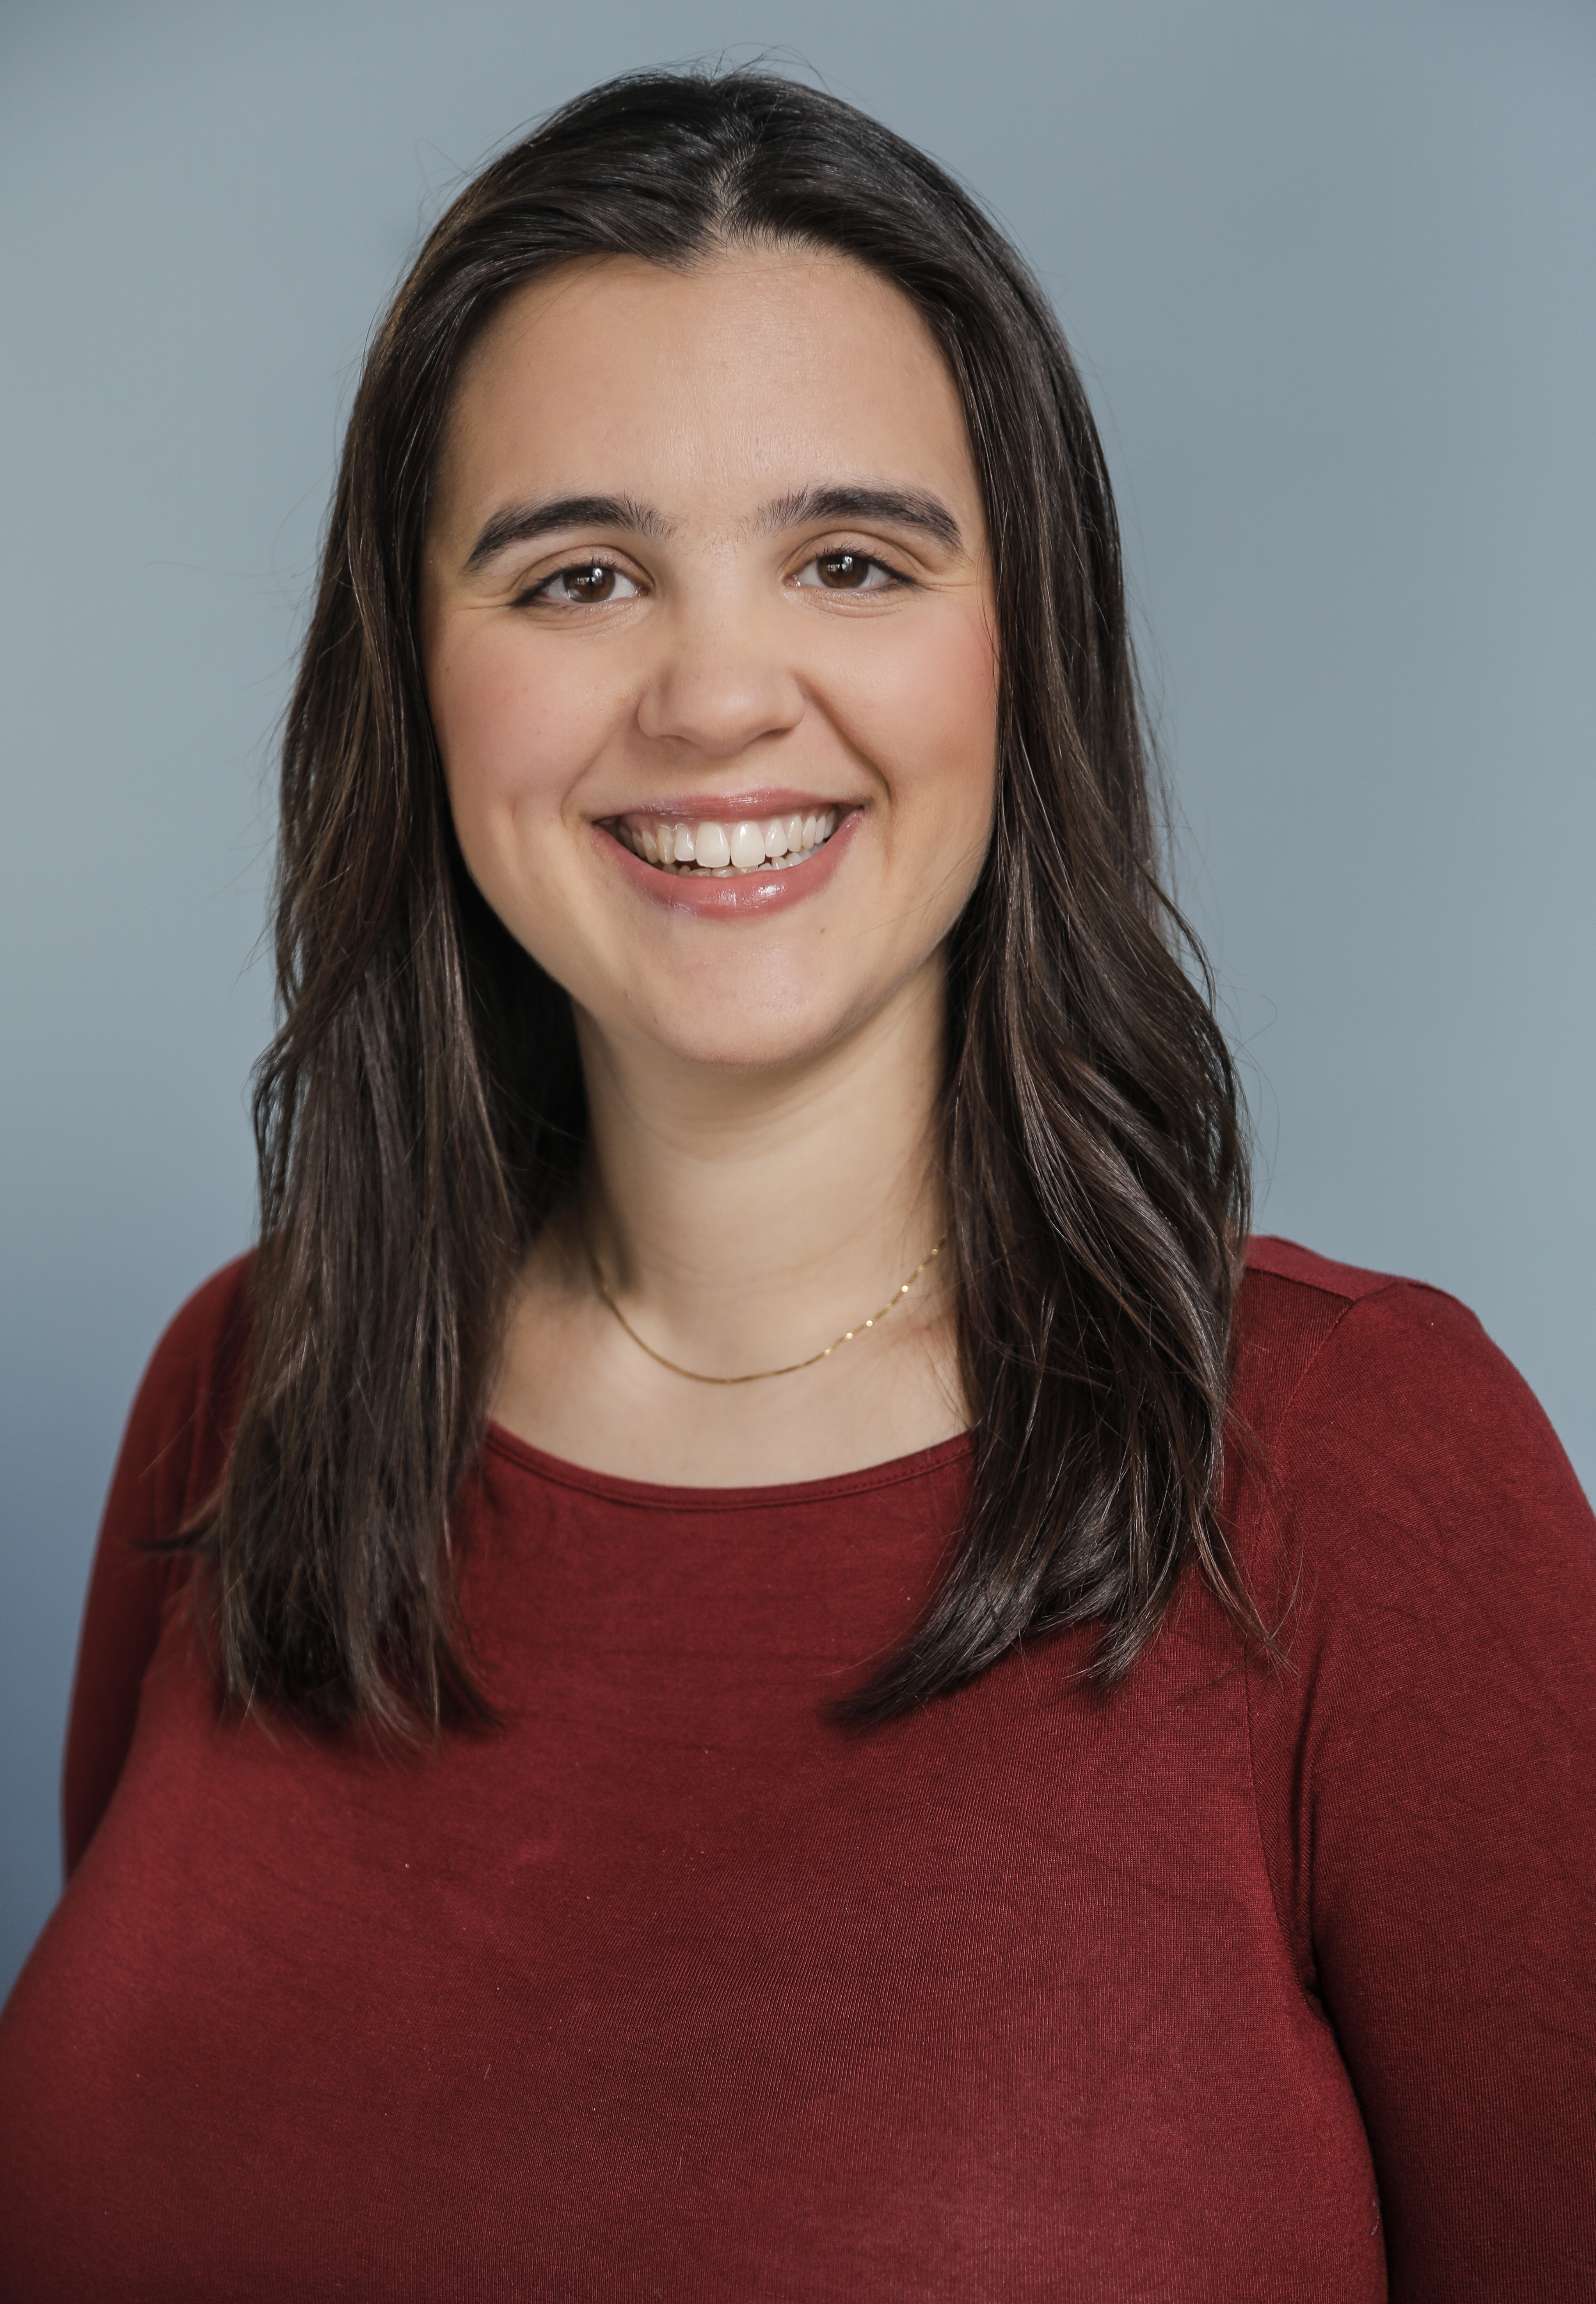 Jessica Vitolano